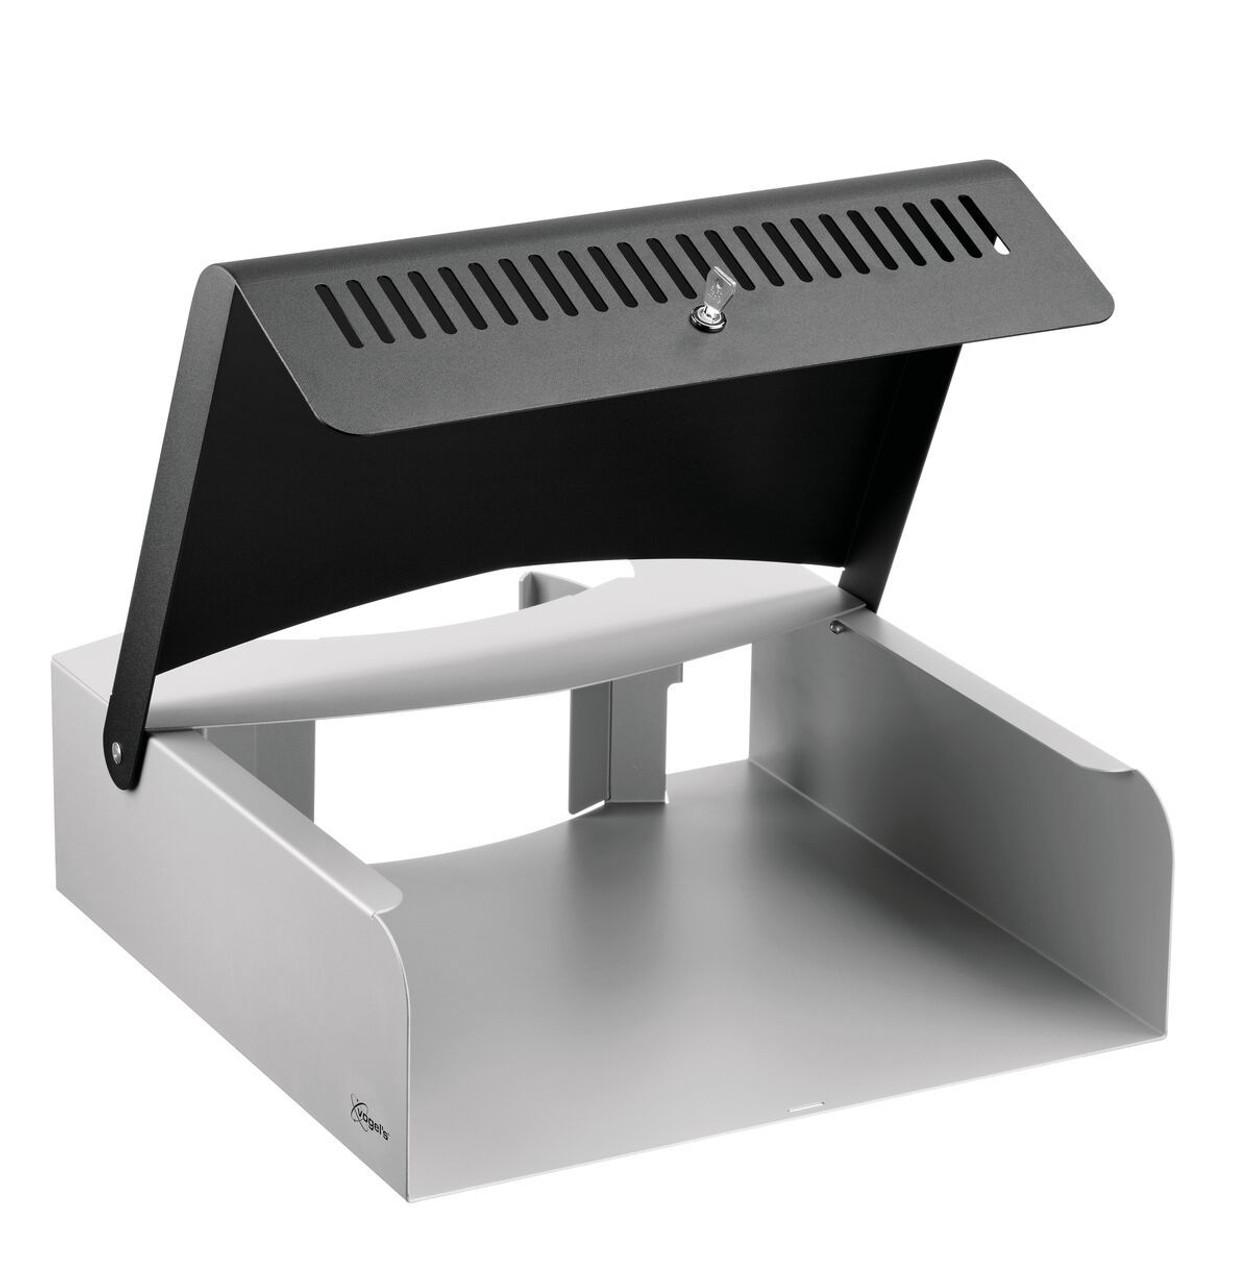 Vogels PFA9052 Locking Cabinet for PFT2520 / PFF2420